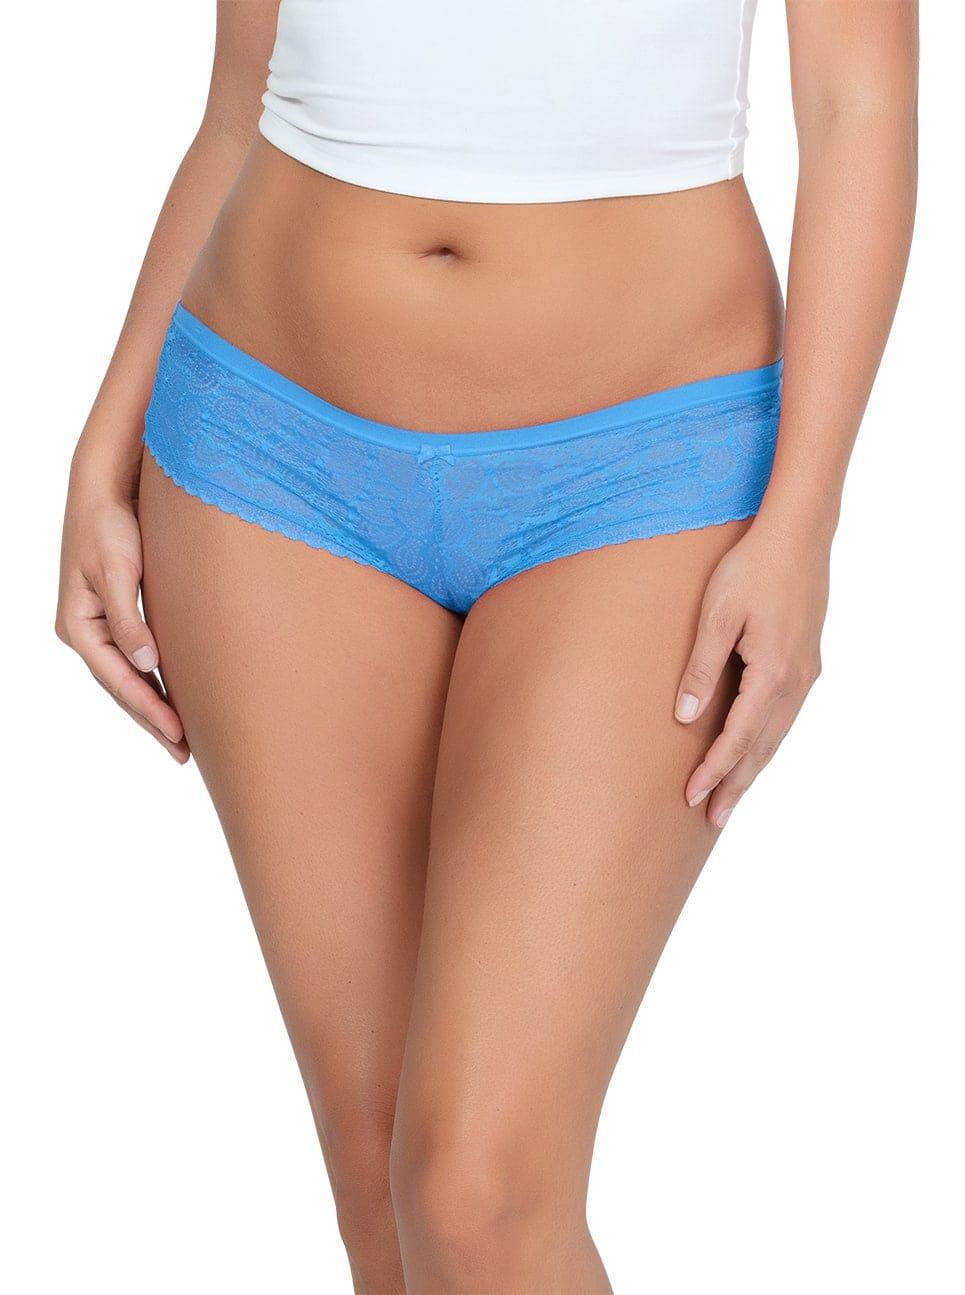 ParfaitPanty SoGlam HIPSTERPP502 MediterraneanBlue FRONT 1 - Parfait Panty So Glam Hipster - Mediterranean Blue - PP502